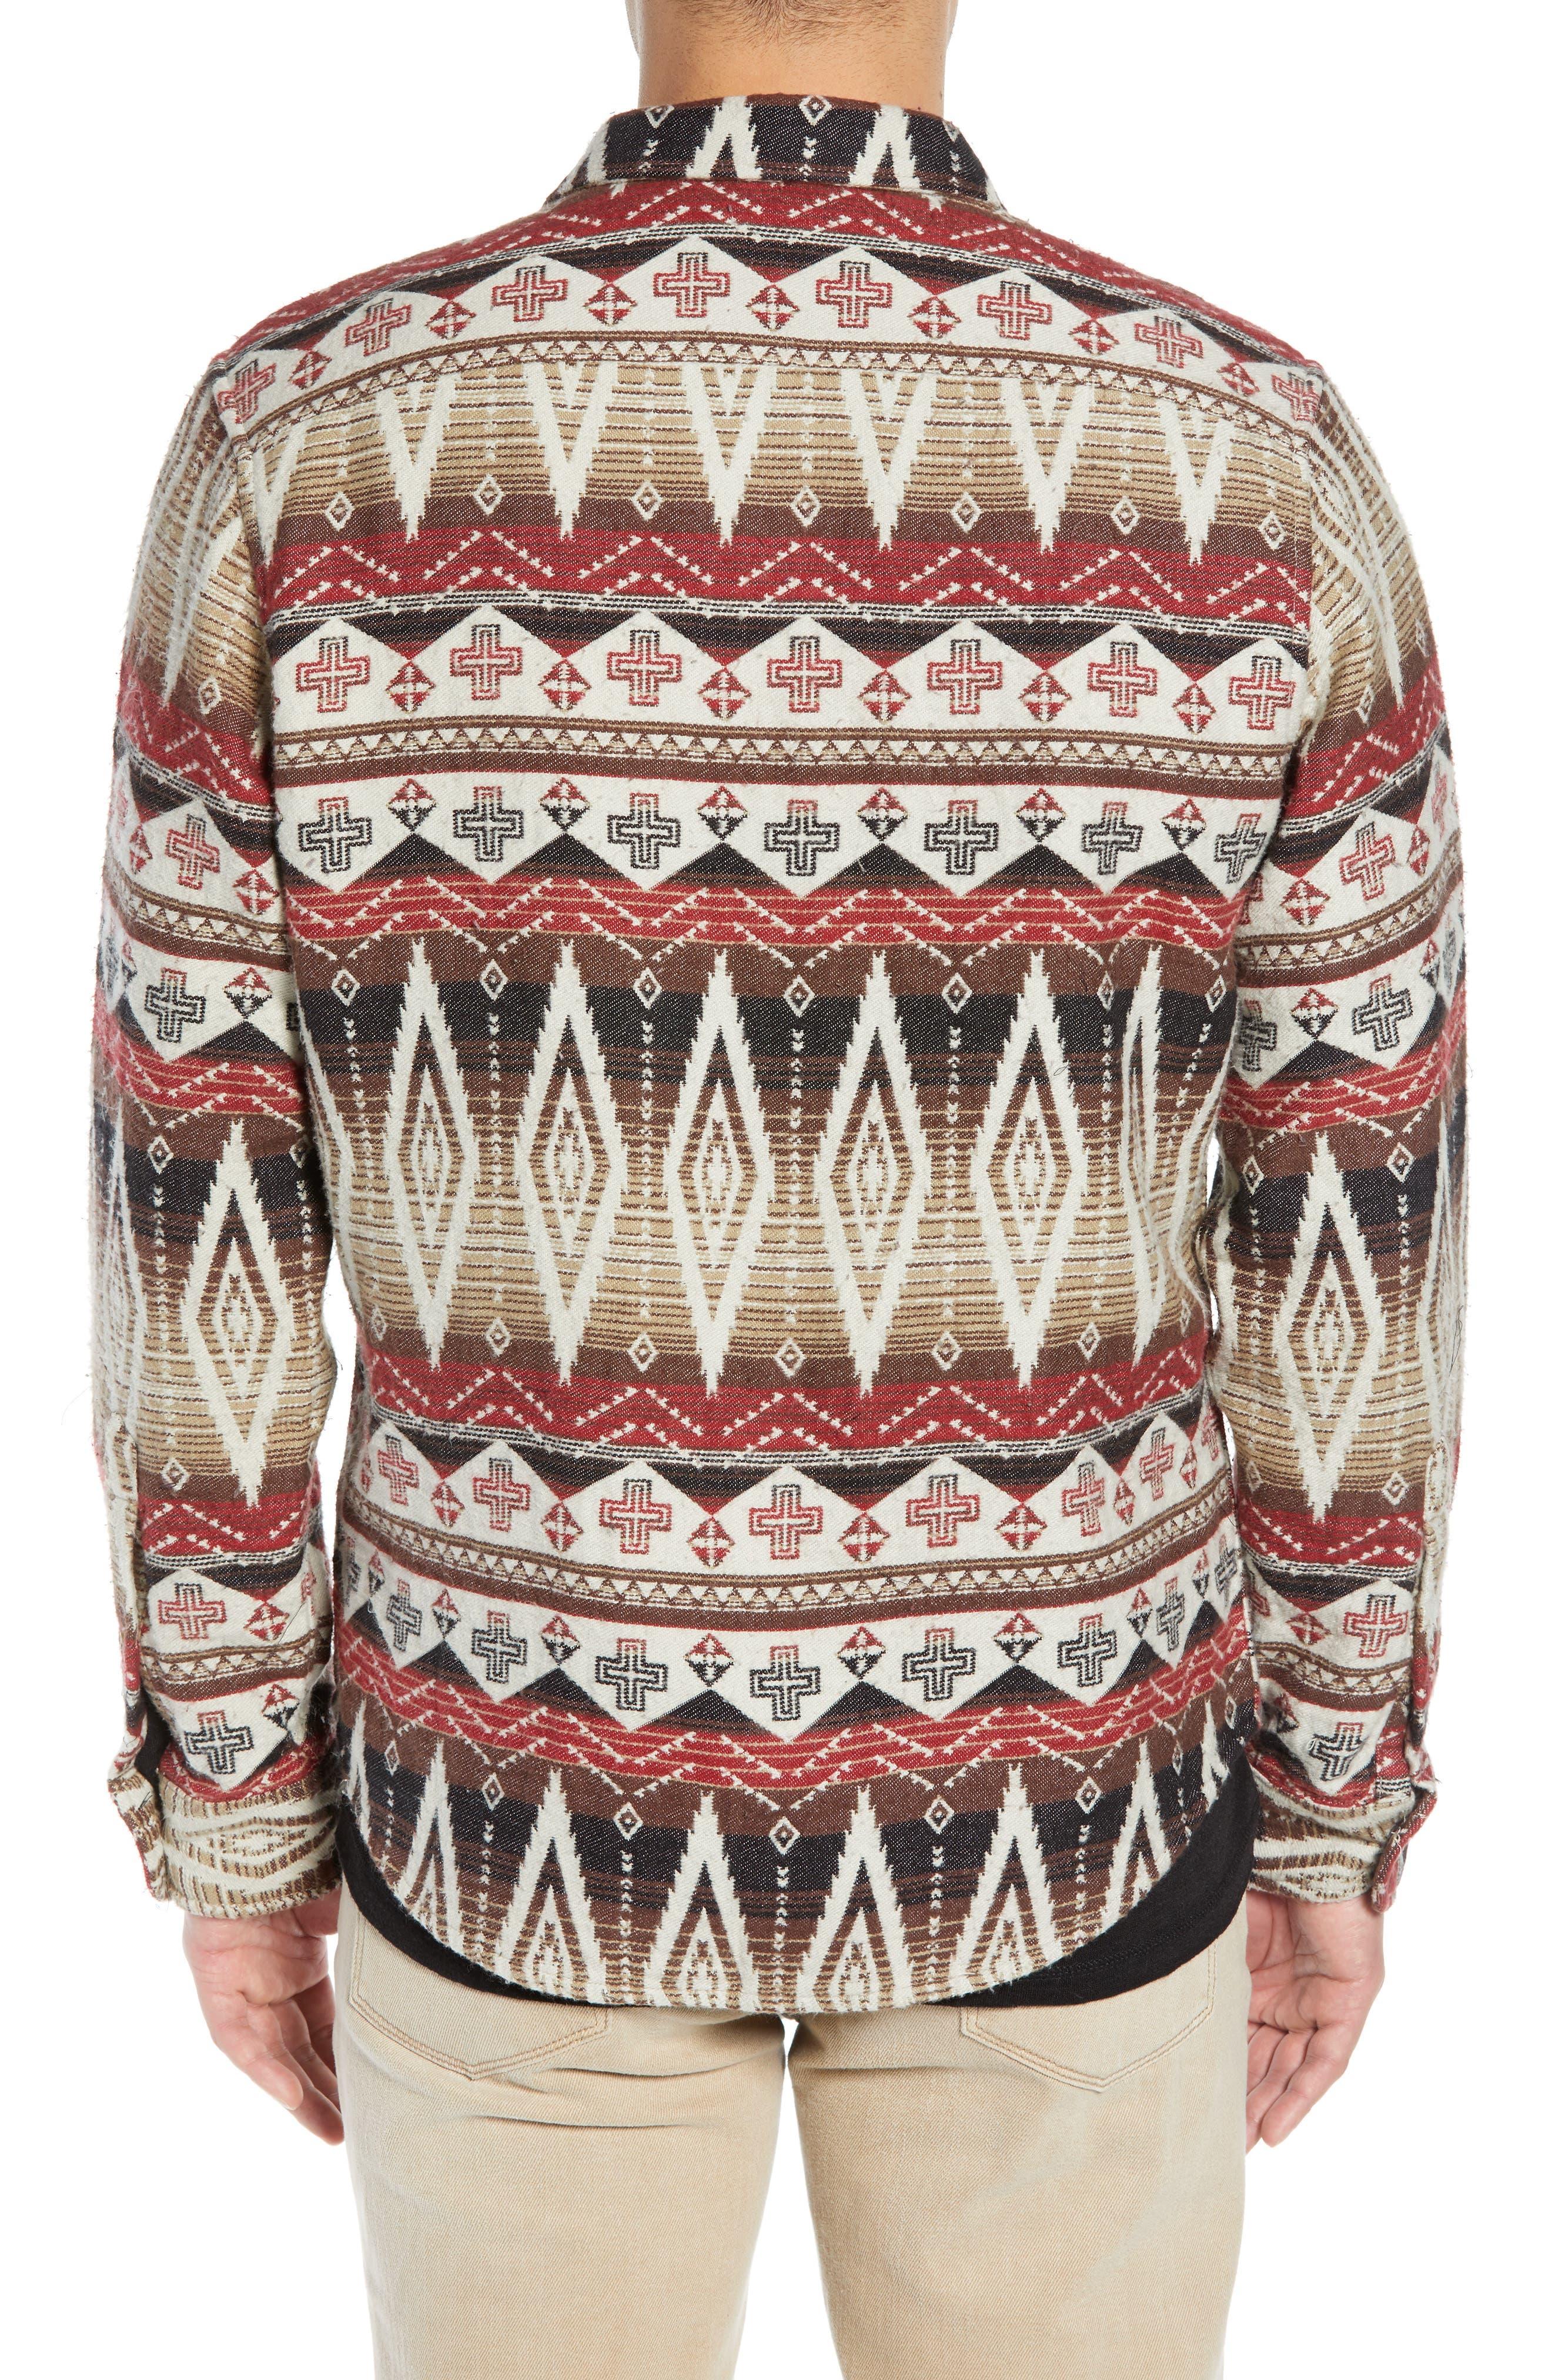 Geo Blanket Shirt Jacket,                             Alternate thumbnail 2, color,                             BEIGE RAINY DAY TRIBAL PRINT